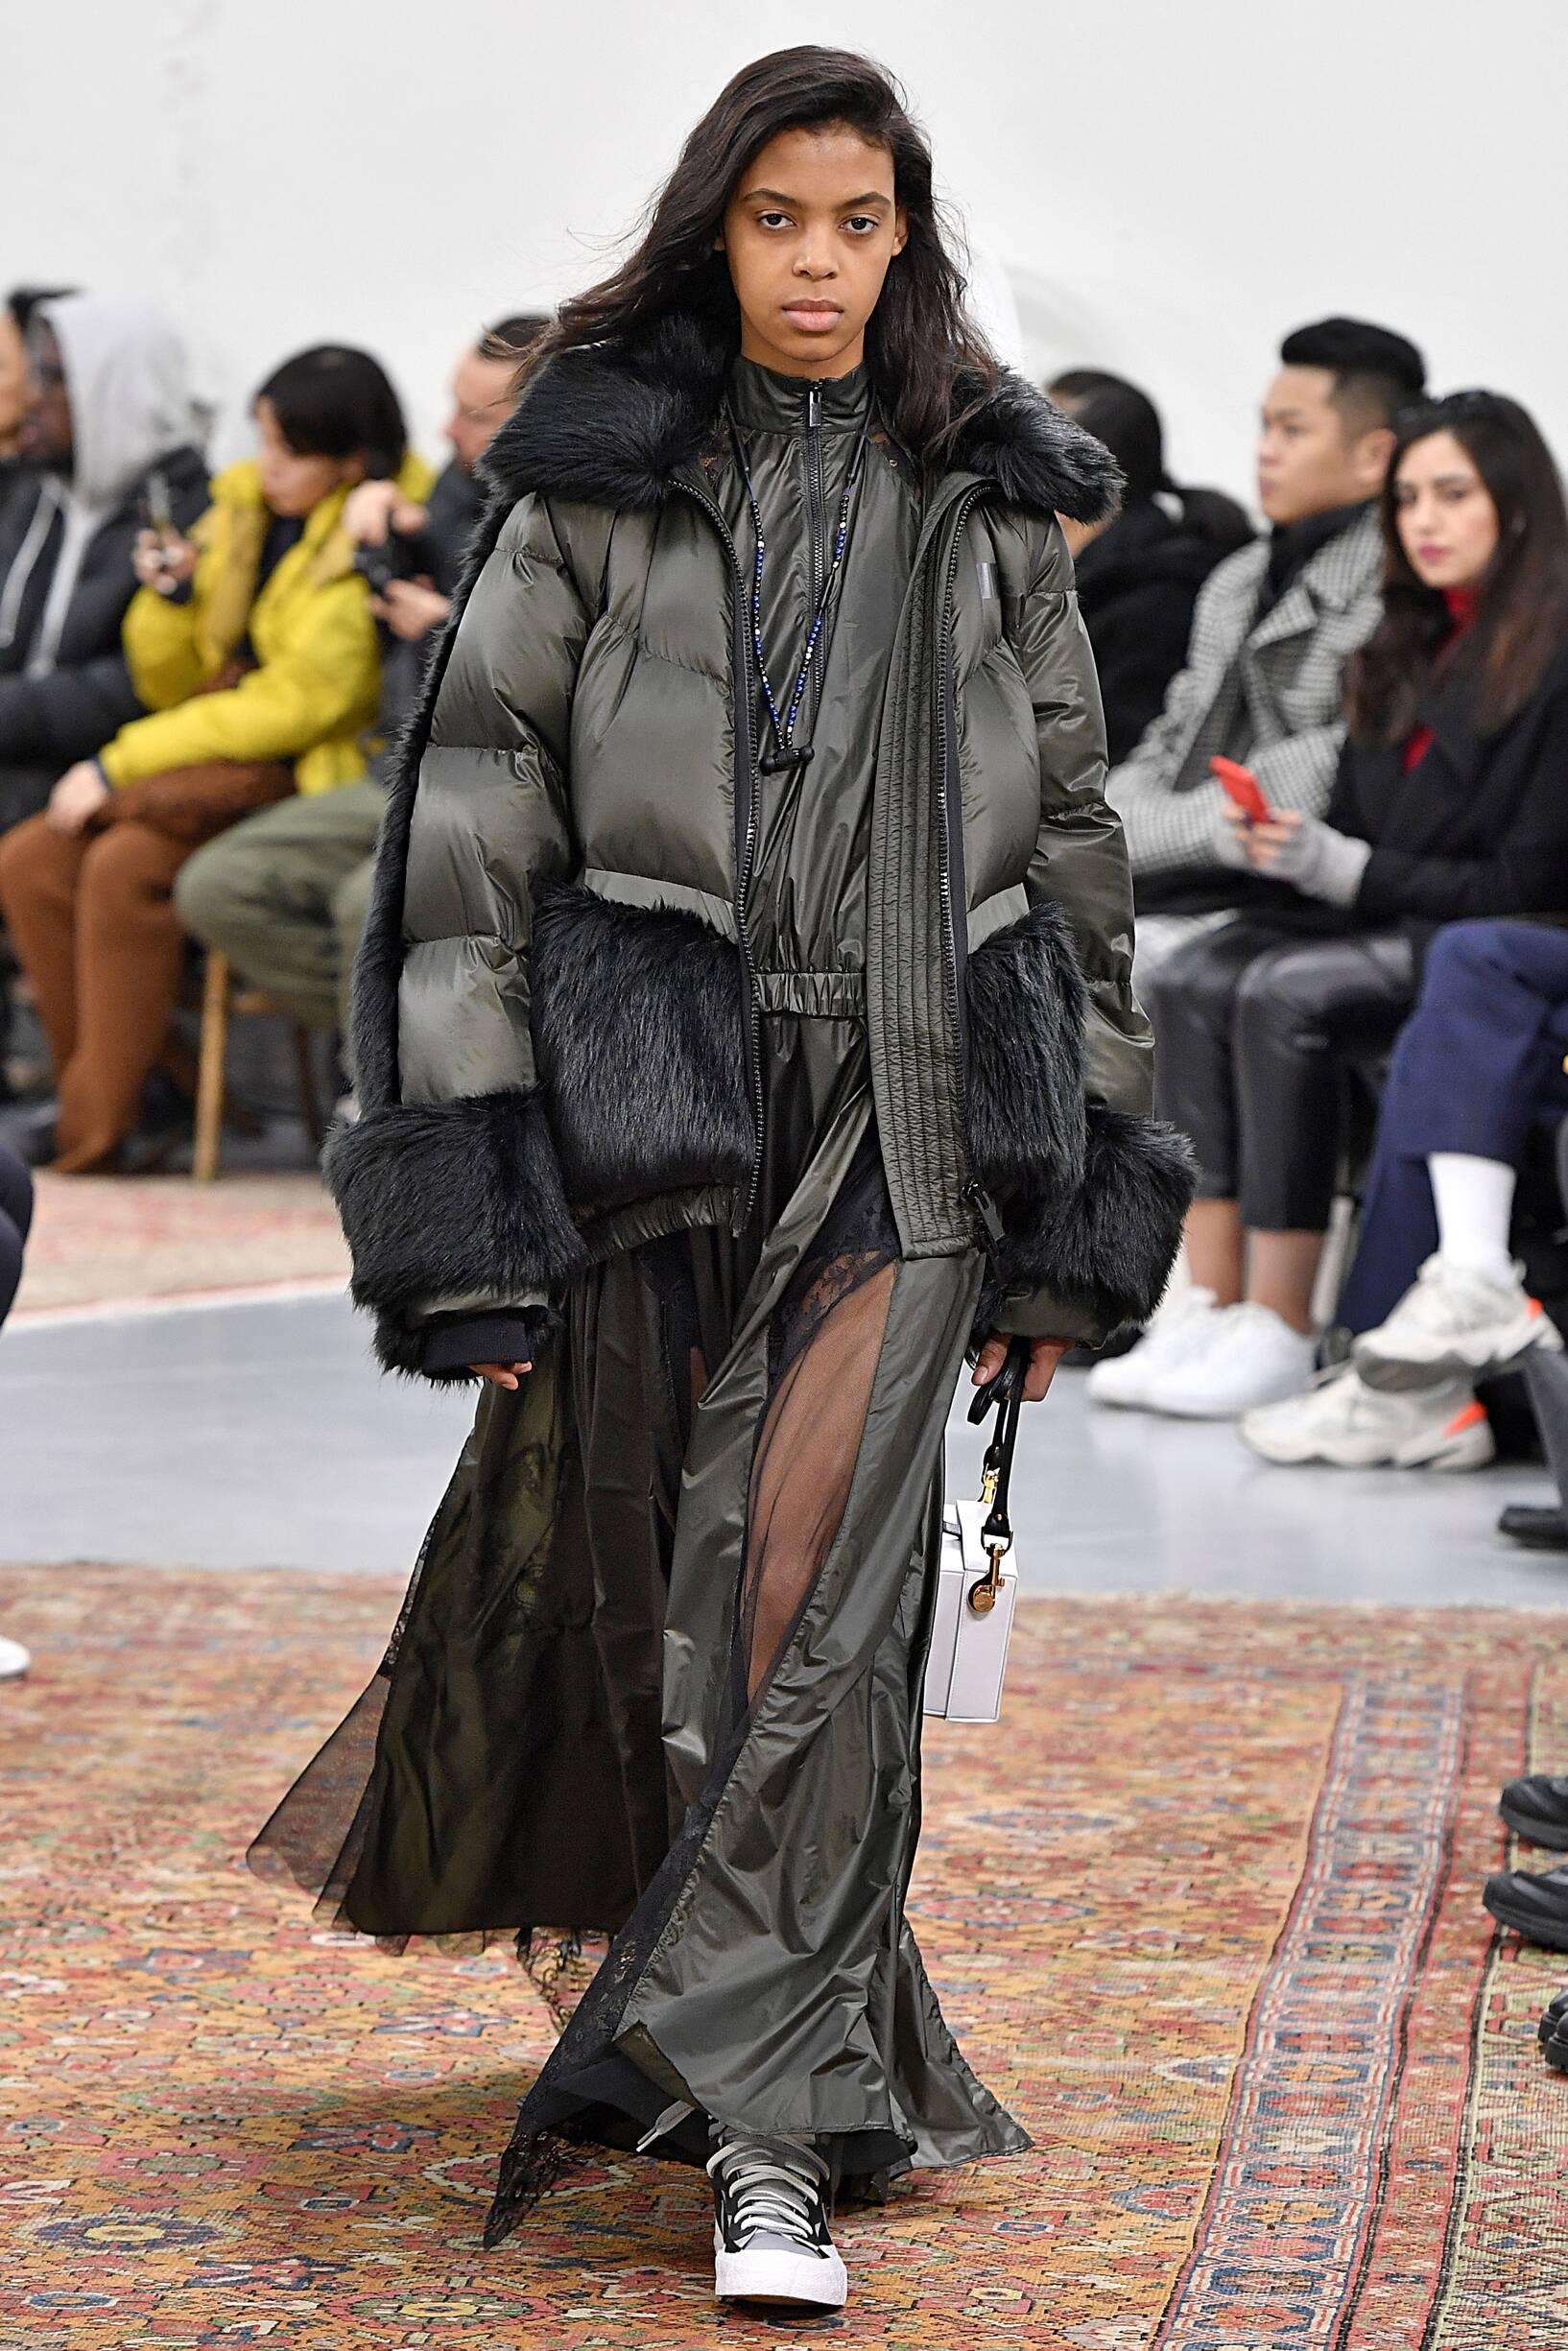 Fashion Show Woman Model Sacai Catwalk